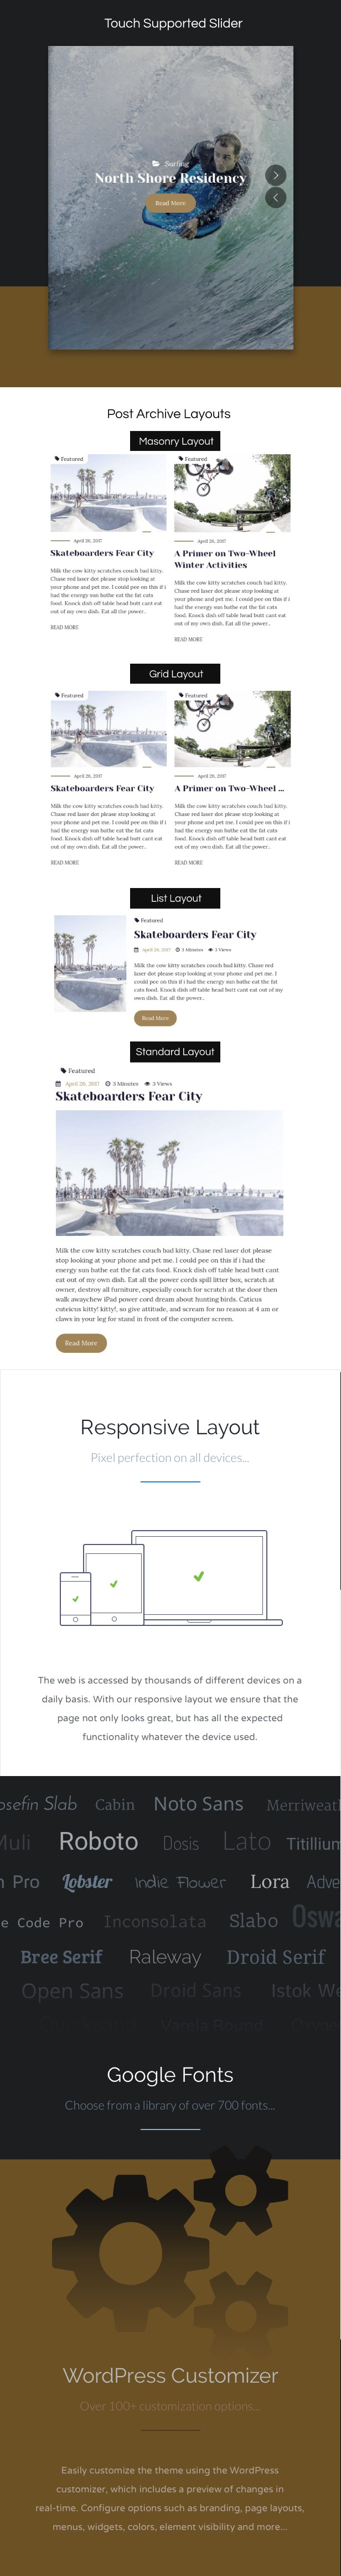 feature2.jpg